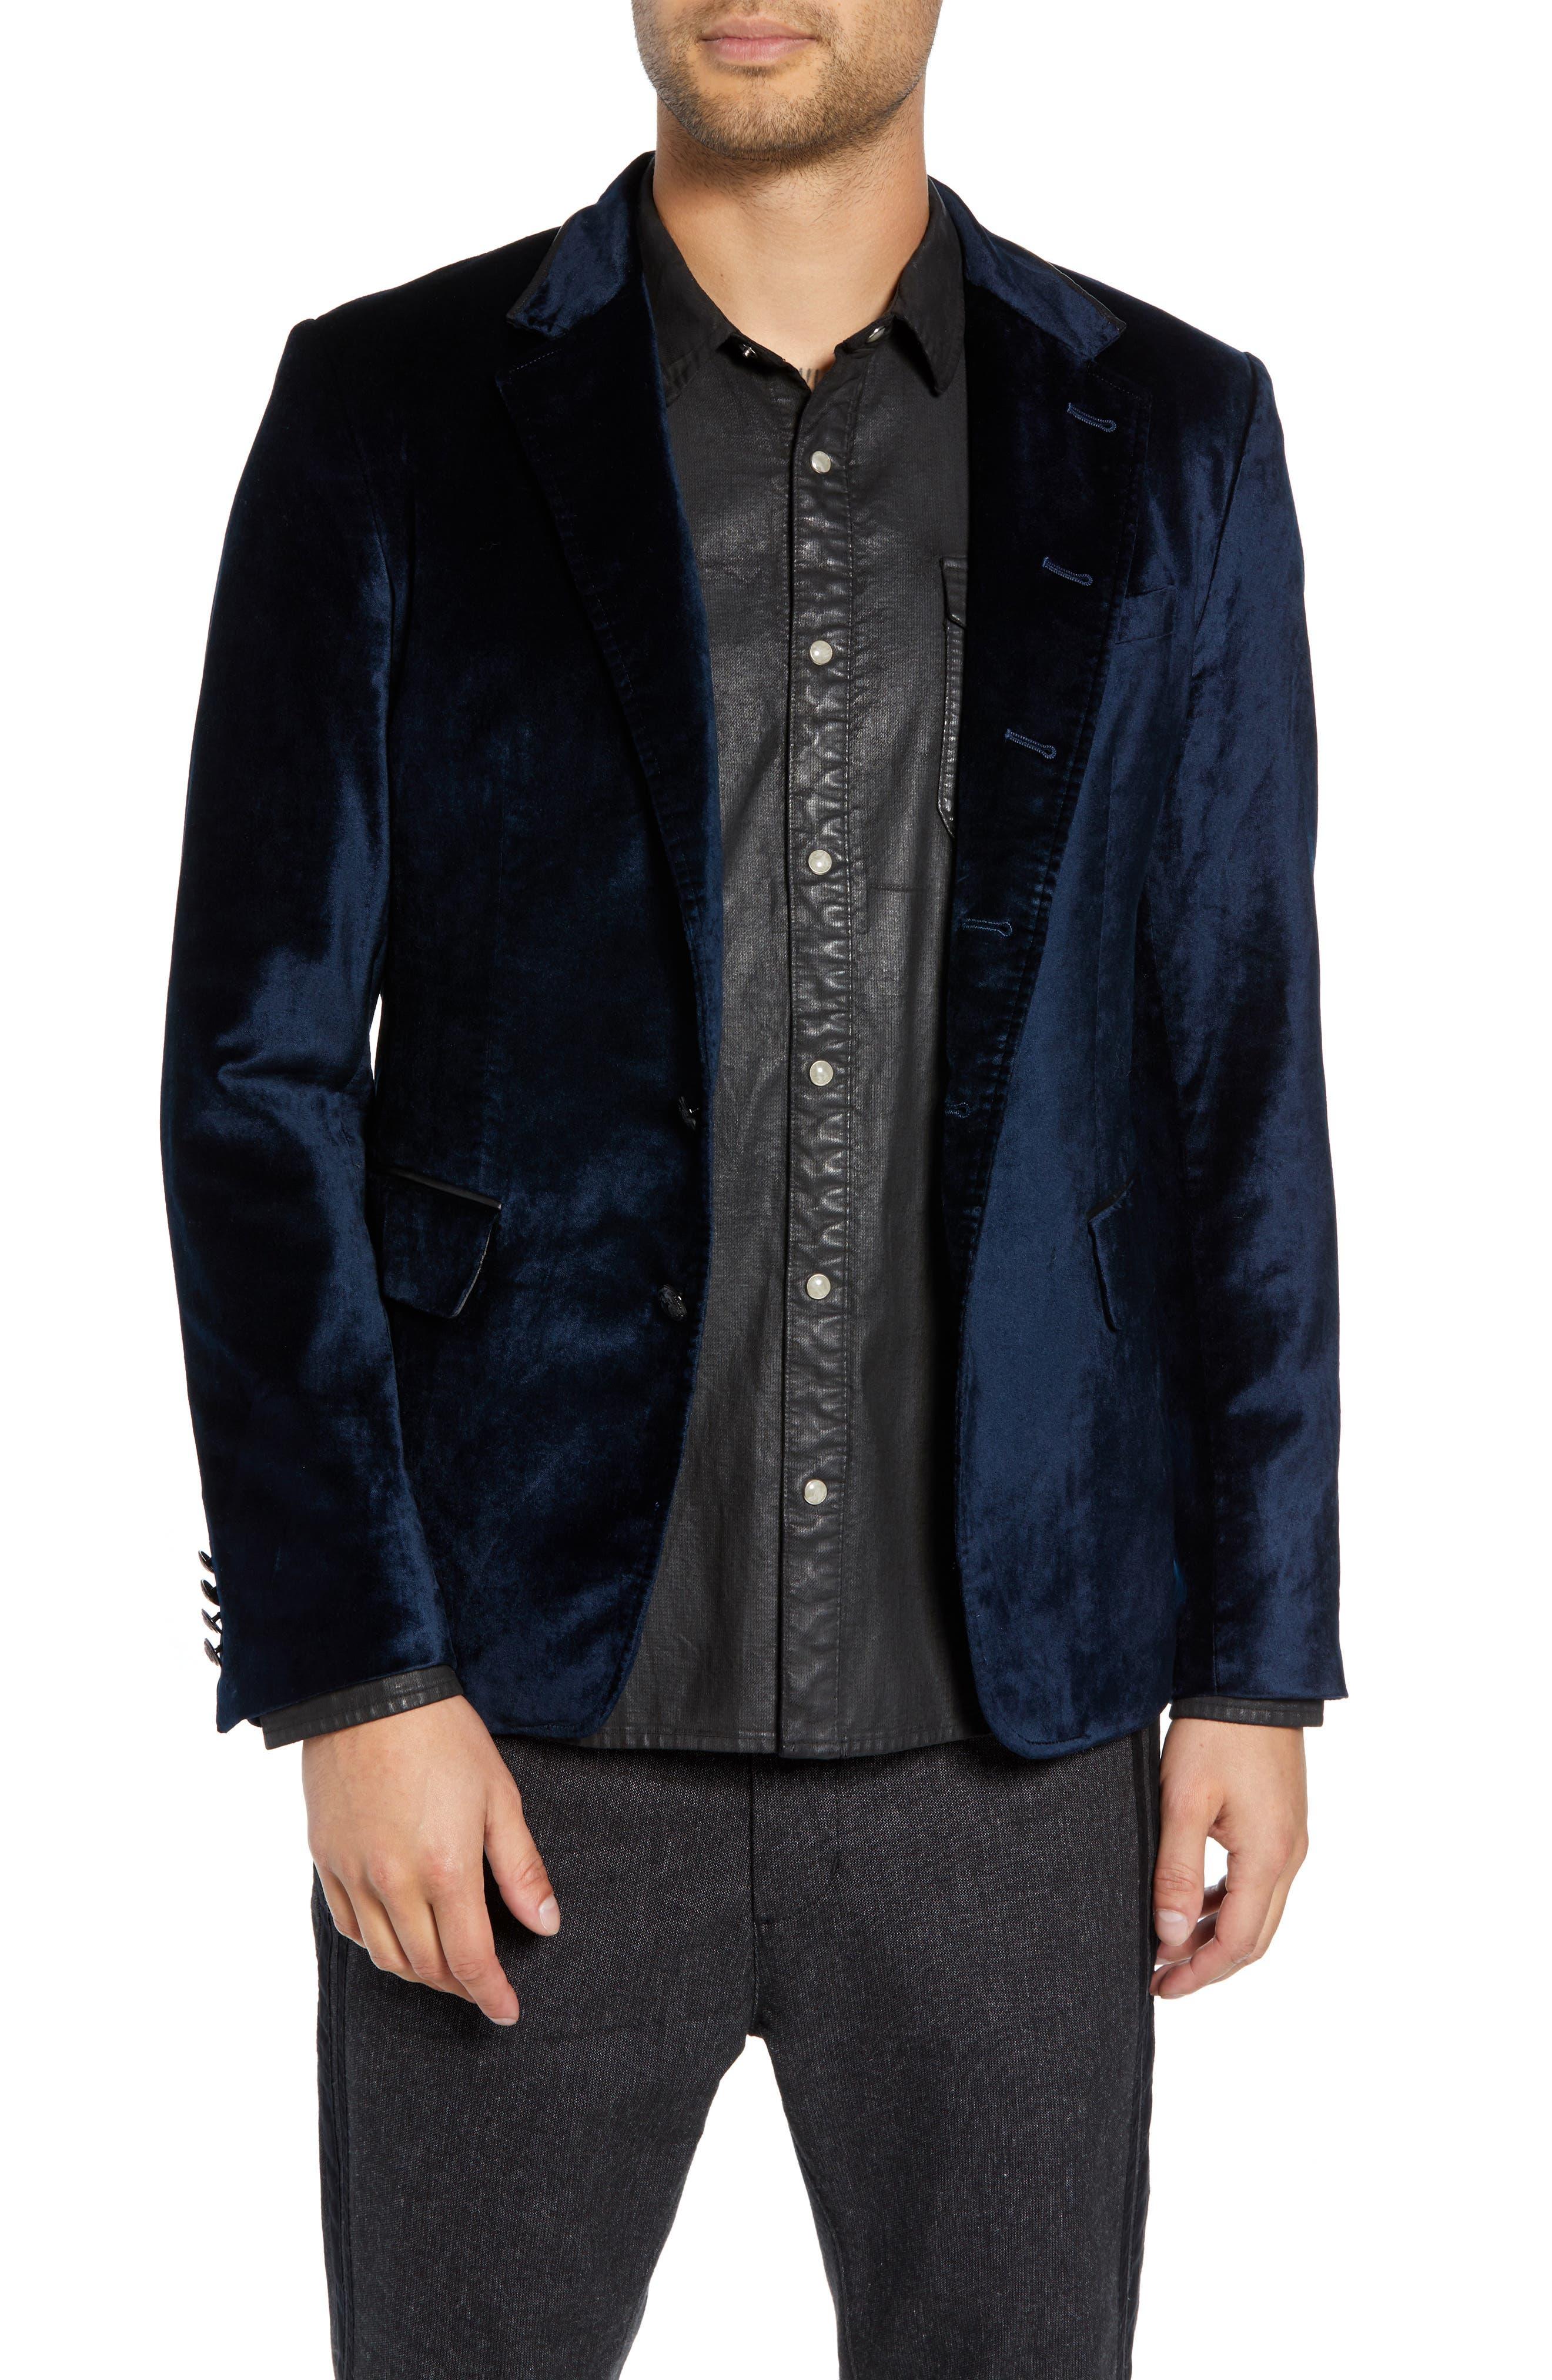 Velvet Dinner Jacket with Leather Trim,                             Main thumbnail 1, color,                             478